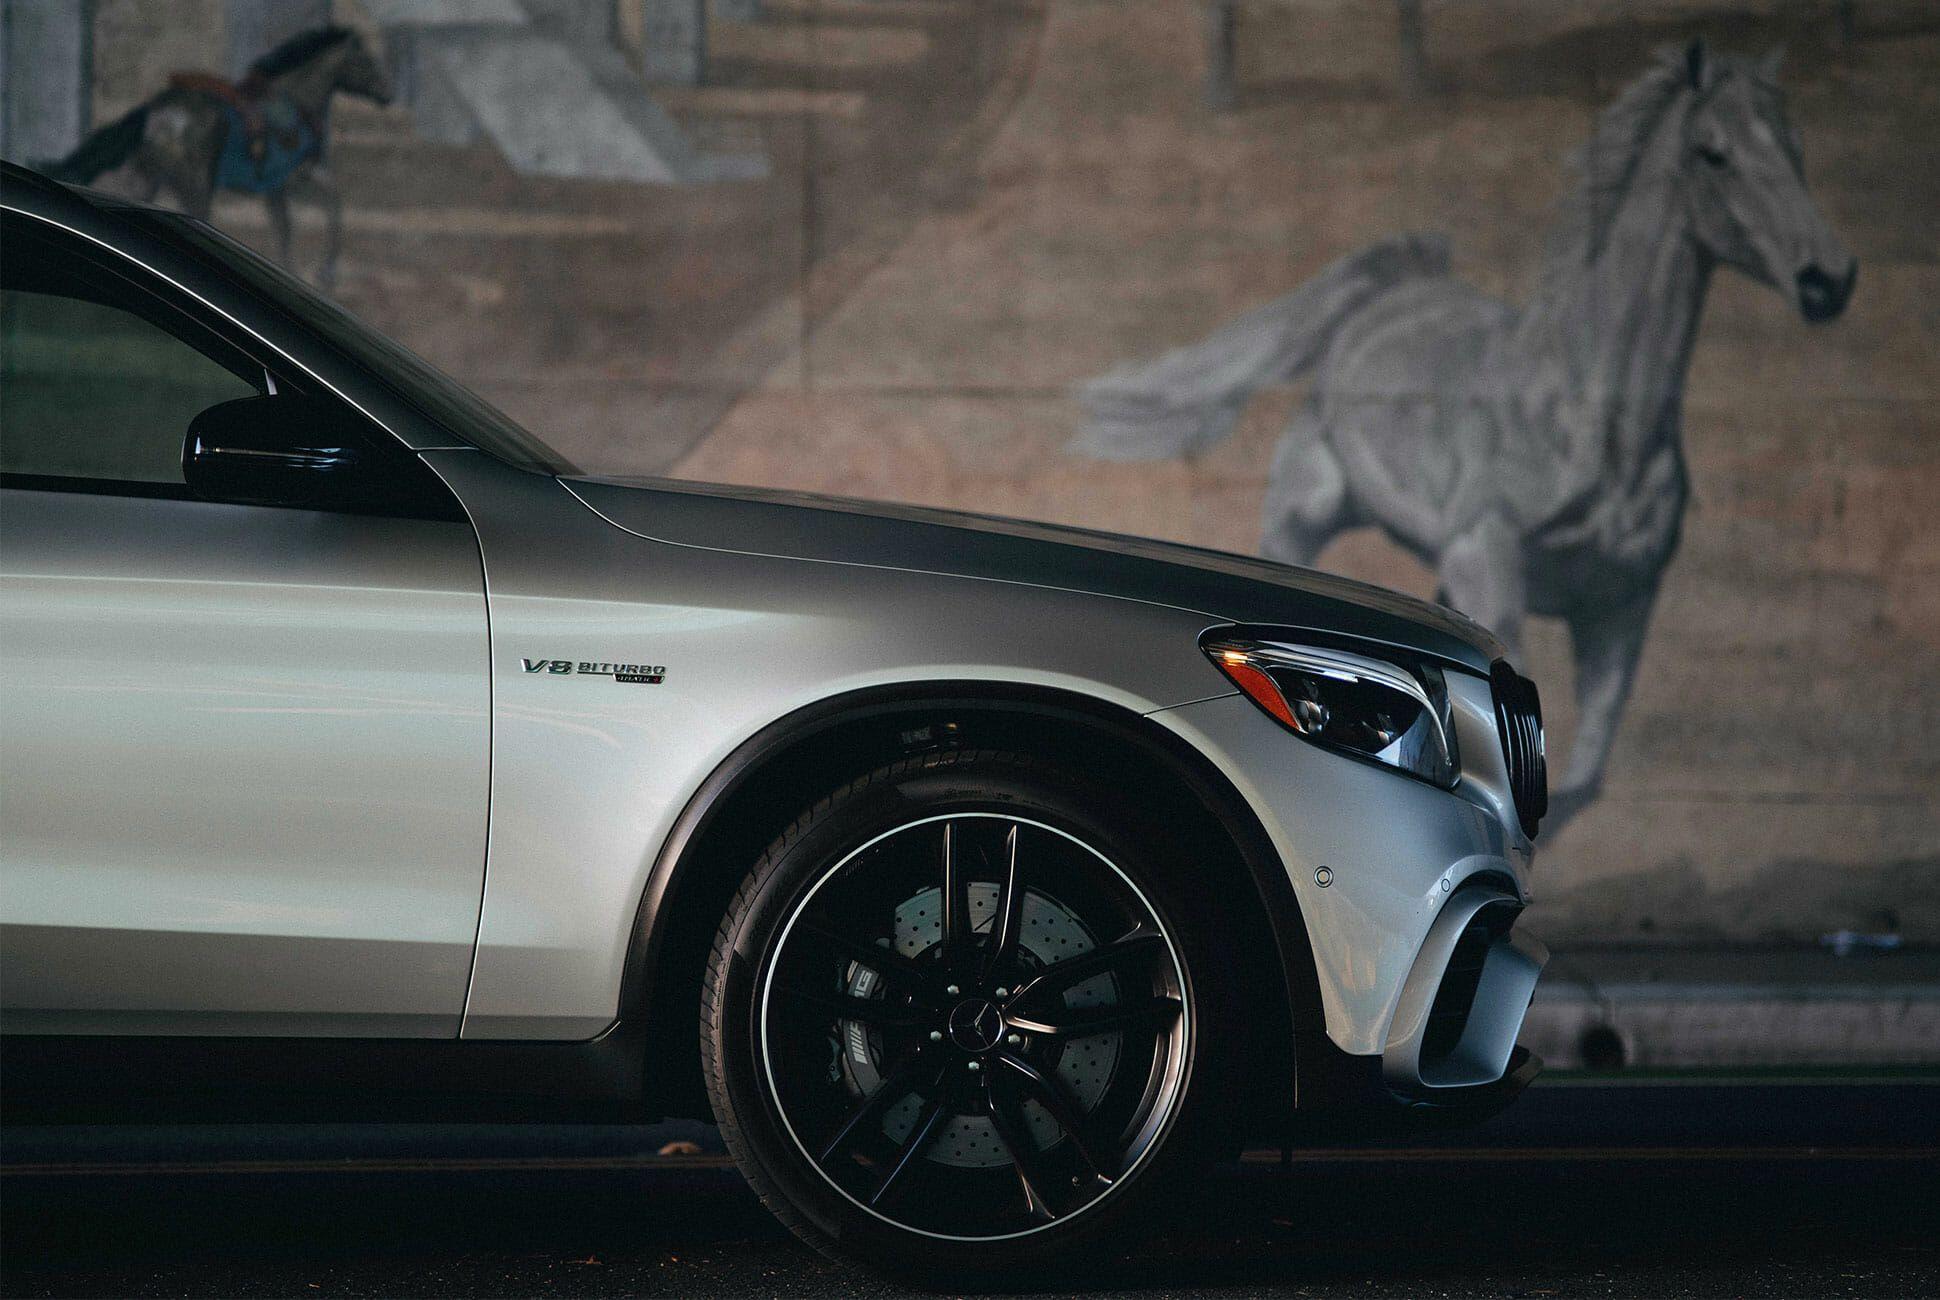 Mercedes-AMG-GLC-63-S-Review-gear-patrol-slide-4